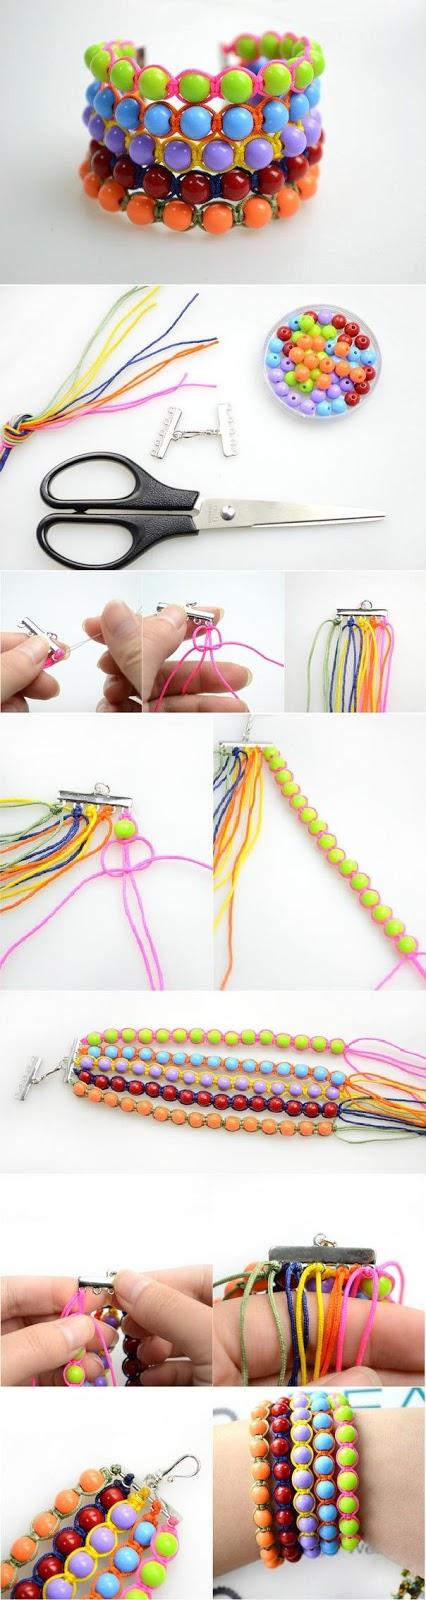 DIY : Make a Wide Beaded Wristband